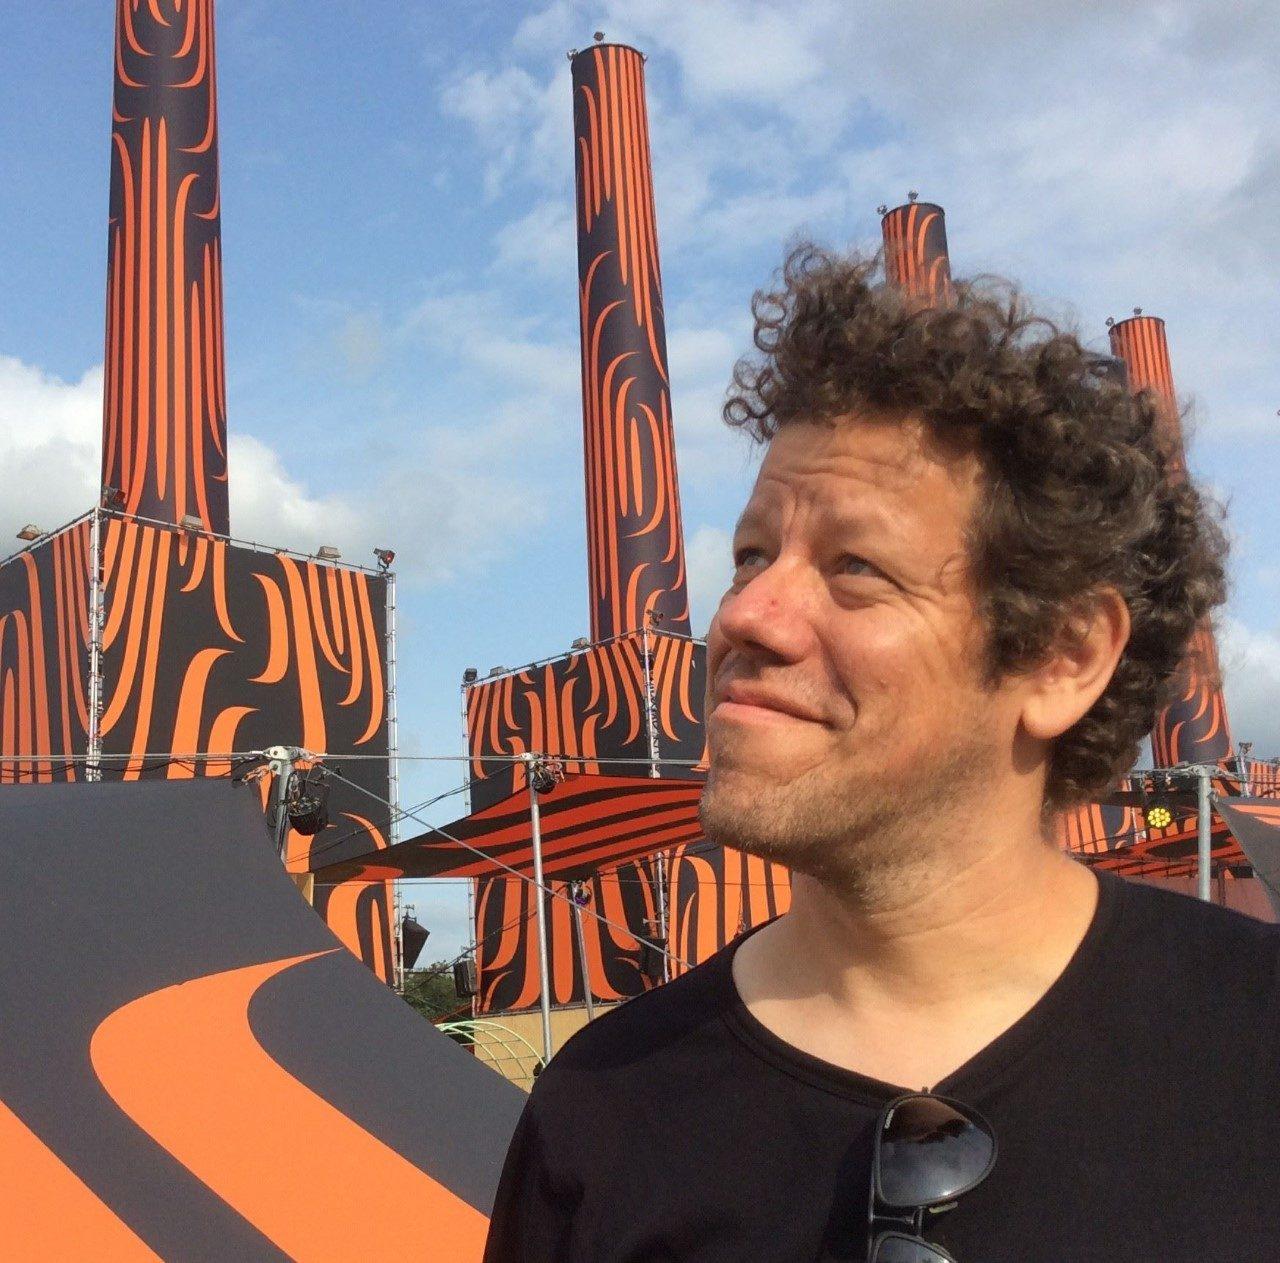 Just van Rossum, teacher at TypeMedia Royal Academy of Art The Hague